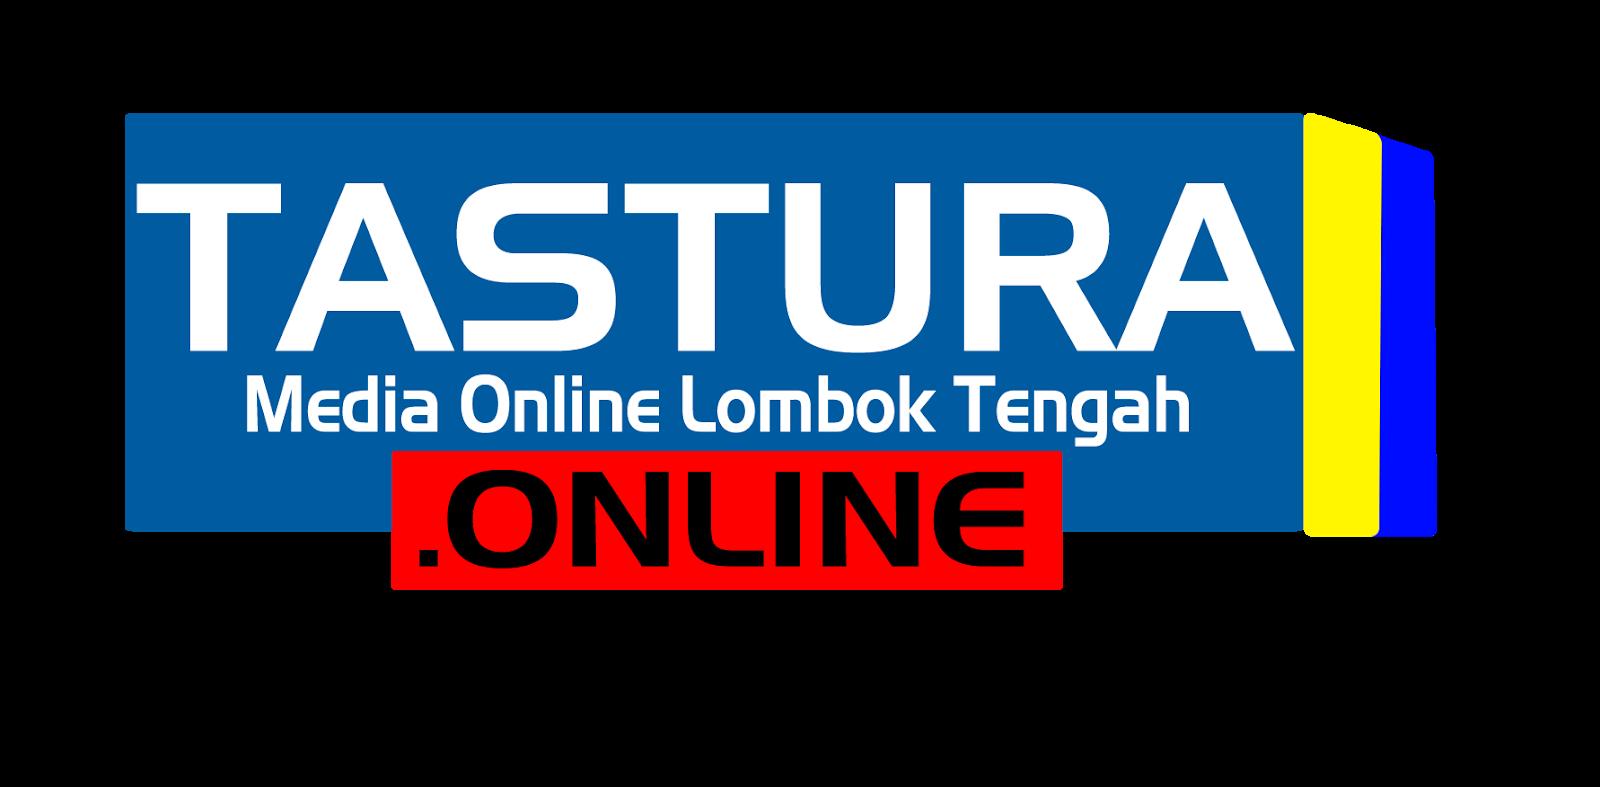 TASTURA ONLINE